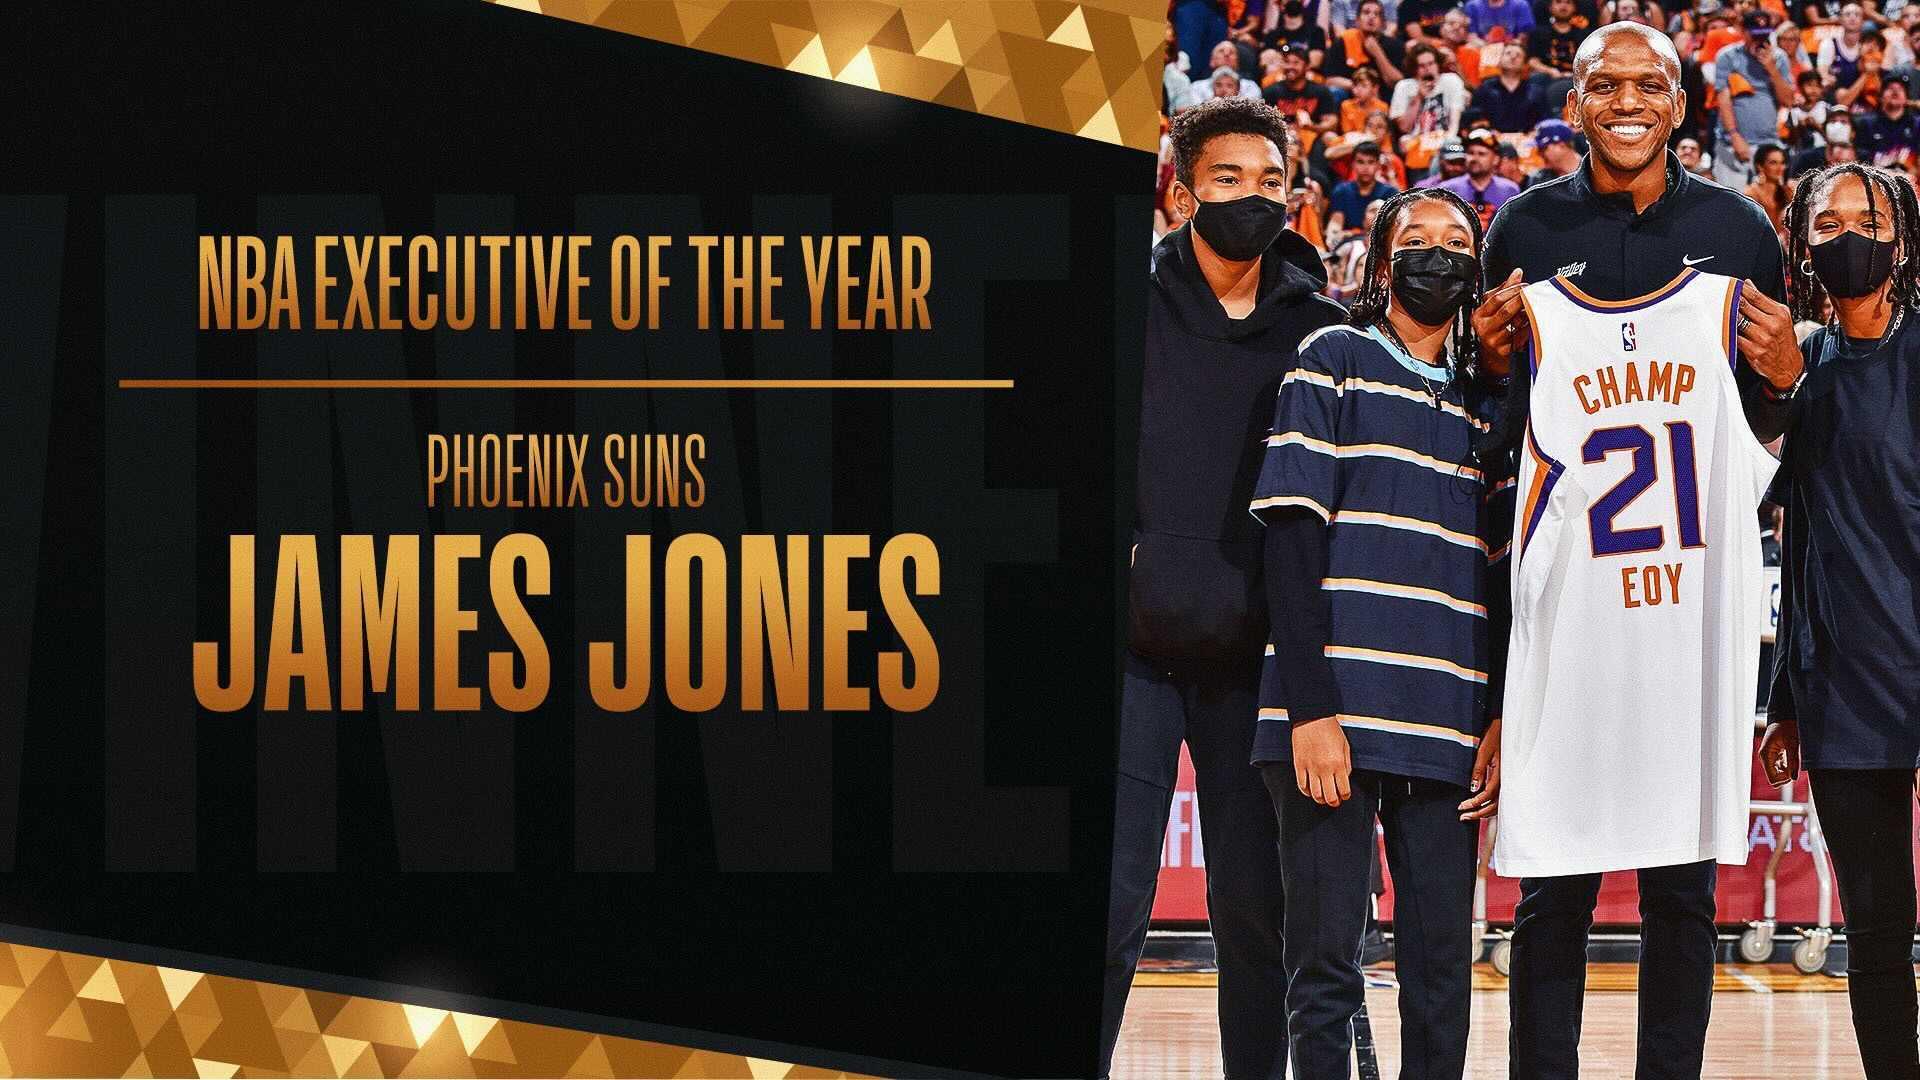 Phoenix's James Jones wins 2020-21 NBA Basketball Executive of the Year award